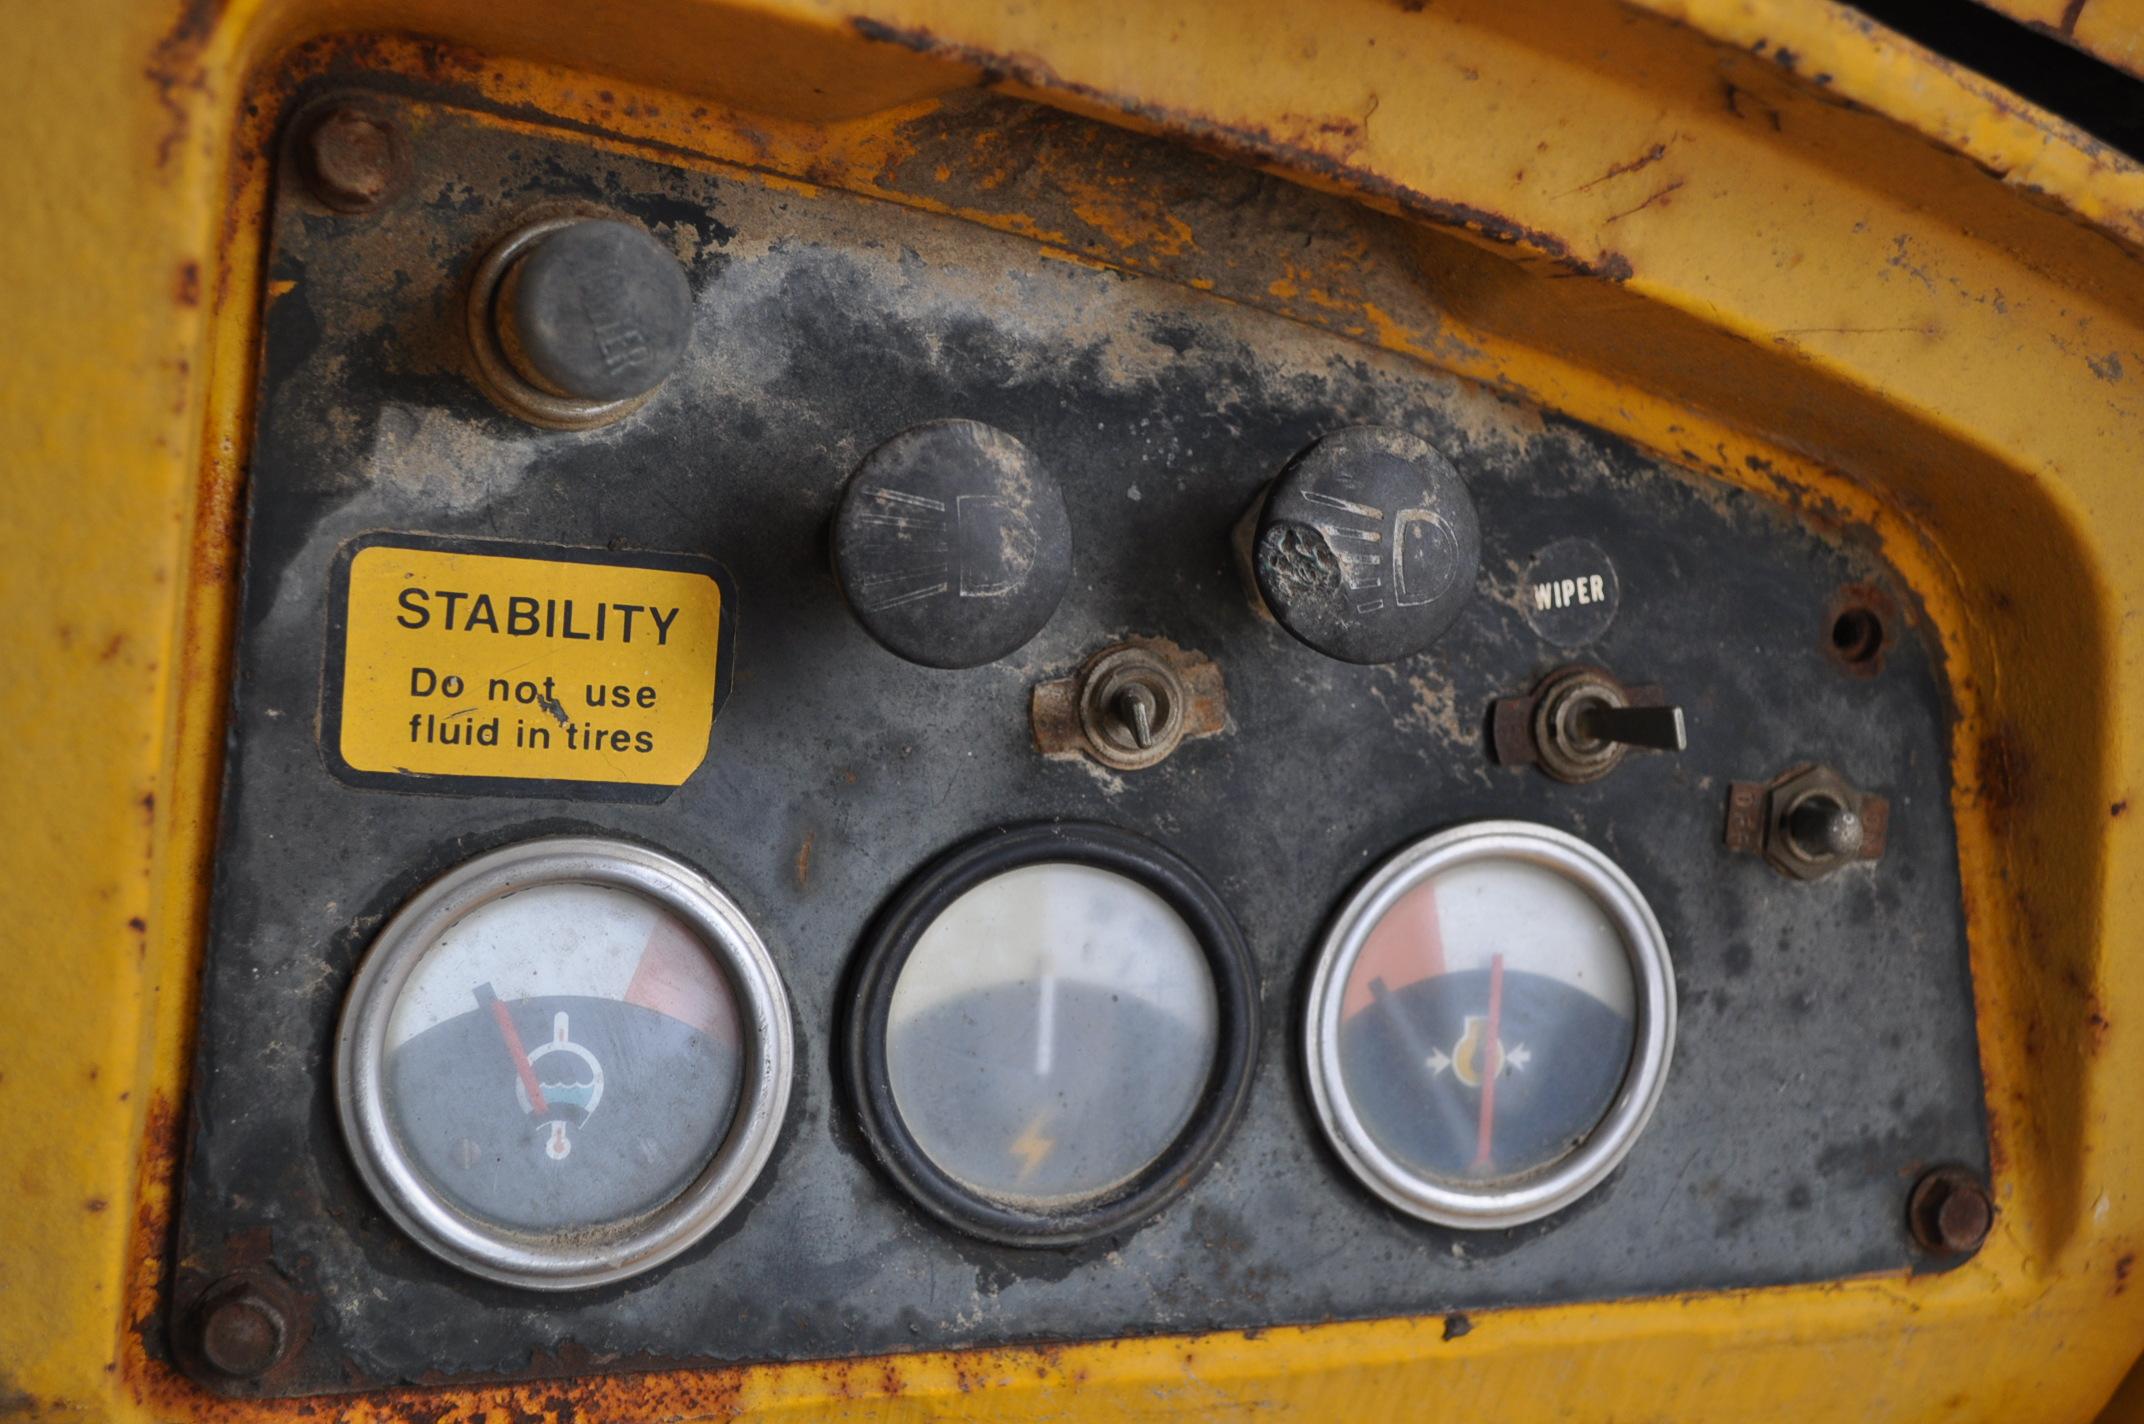 John Deere 544 Payloader, 17.5-25 tires, shows 1074 hrs, SN 0767621 - Image 16 of 16